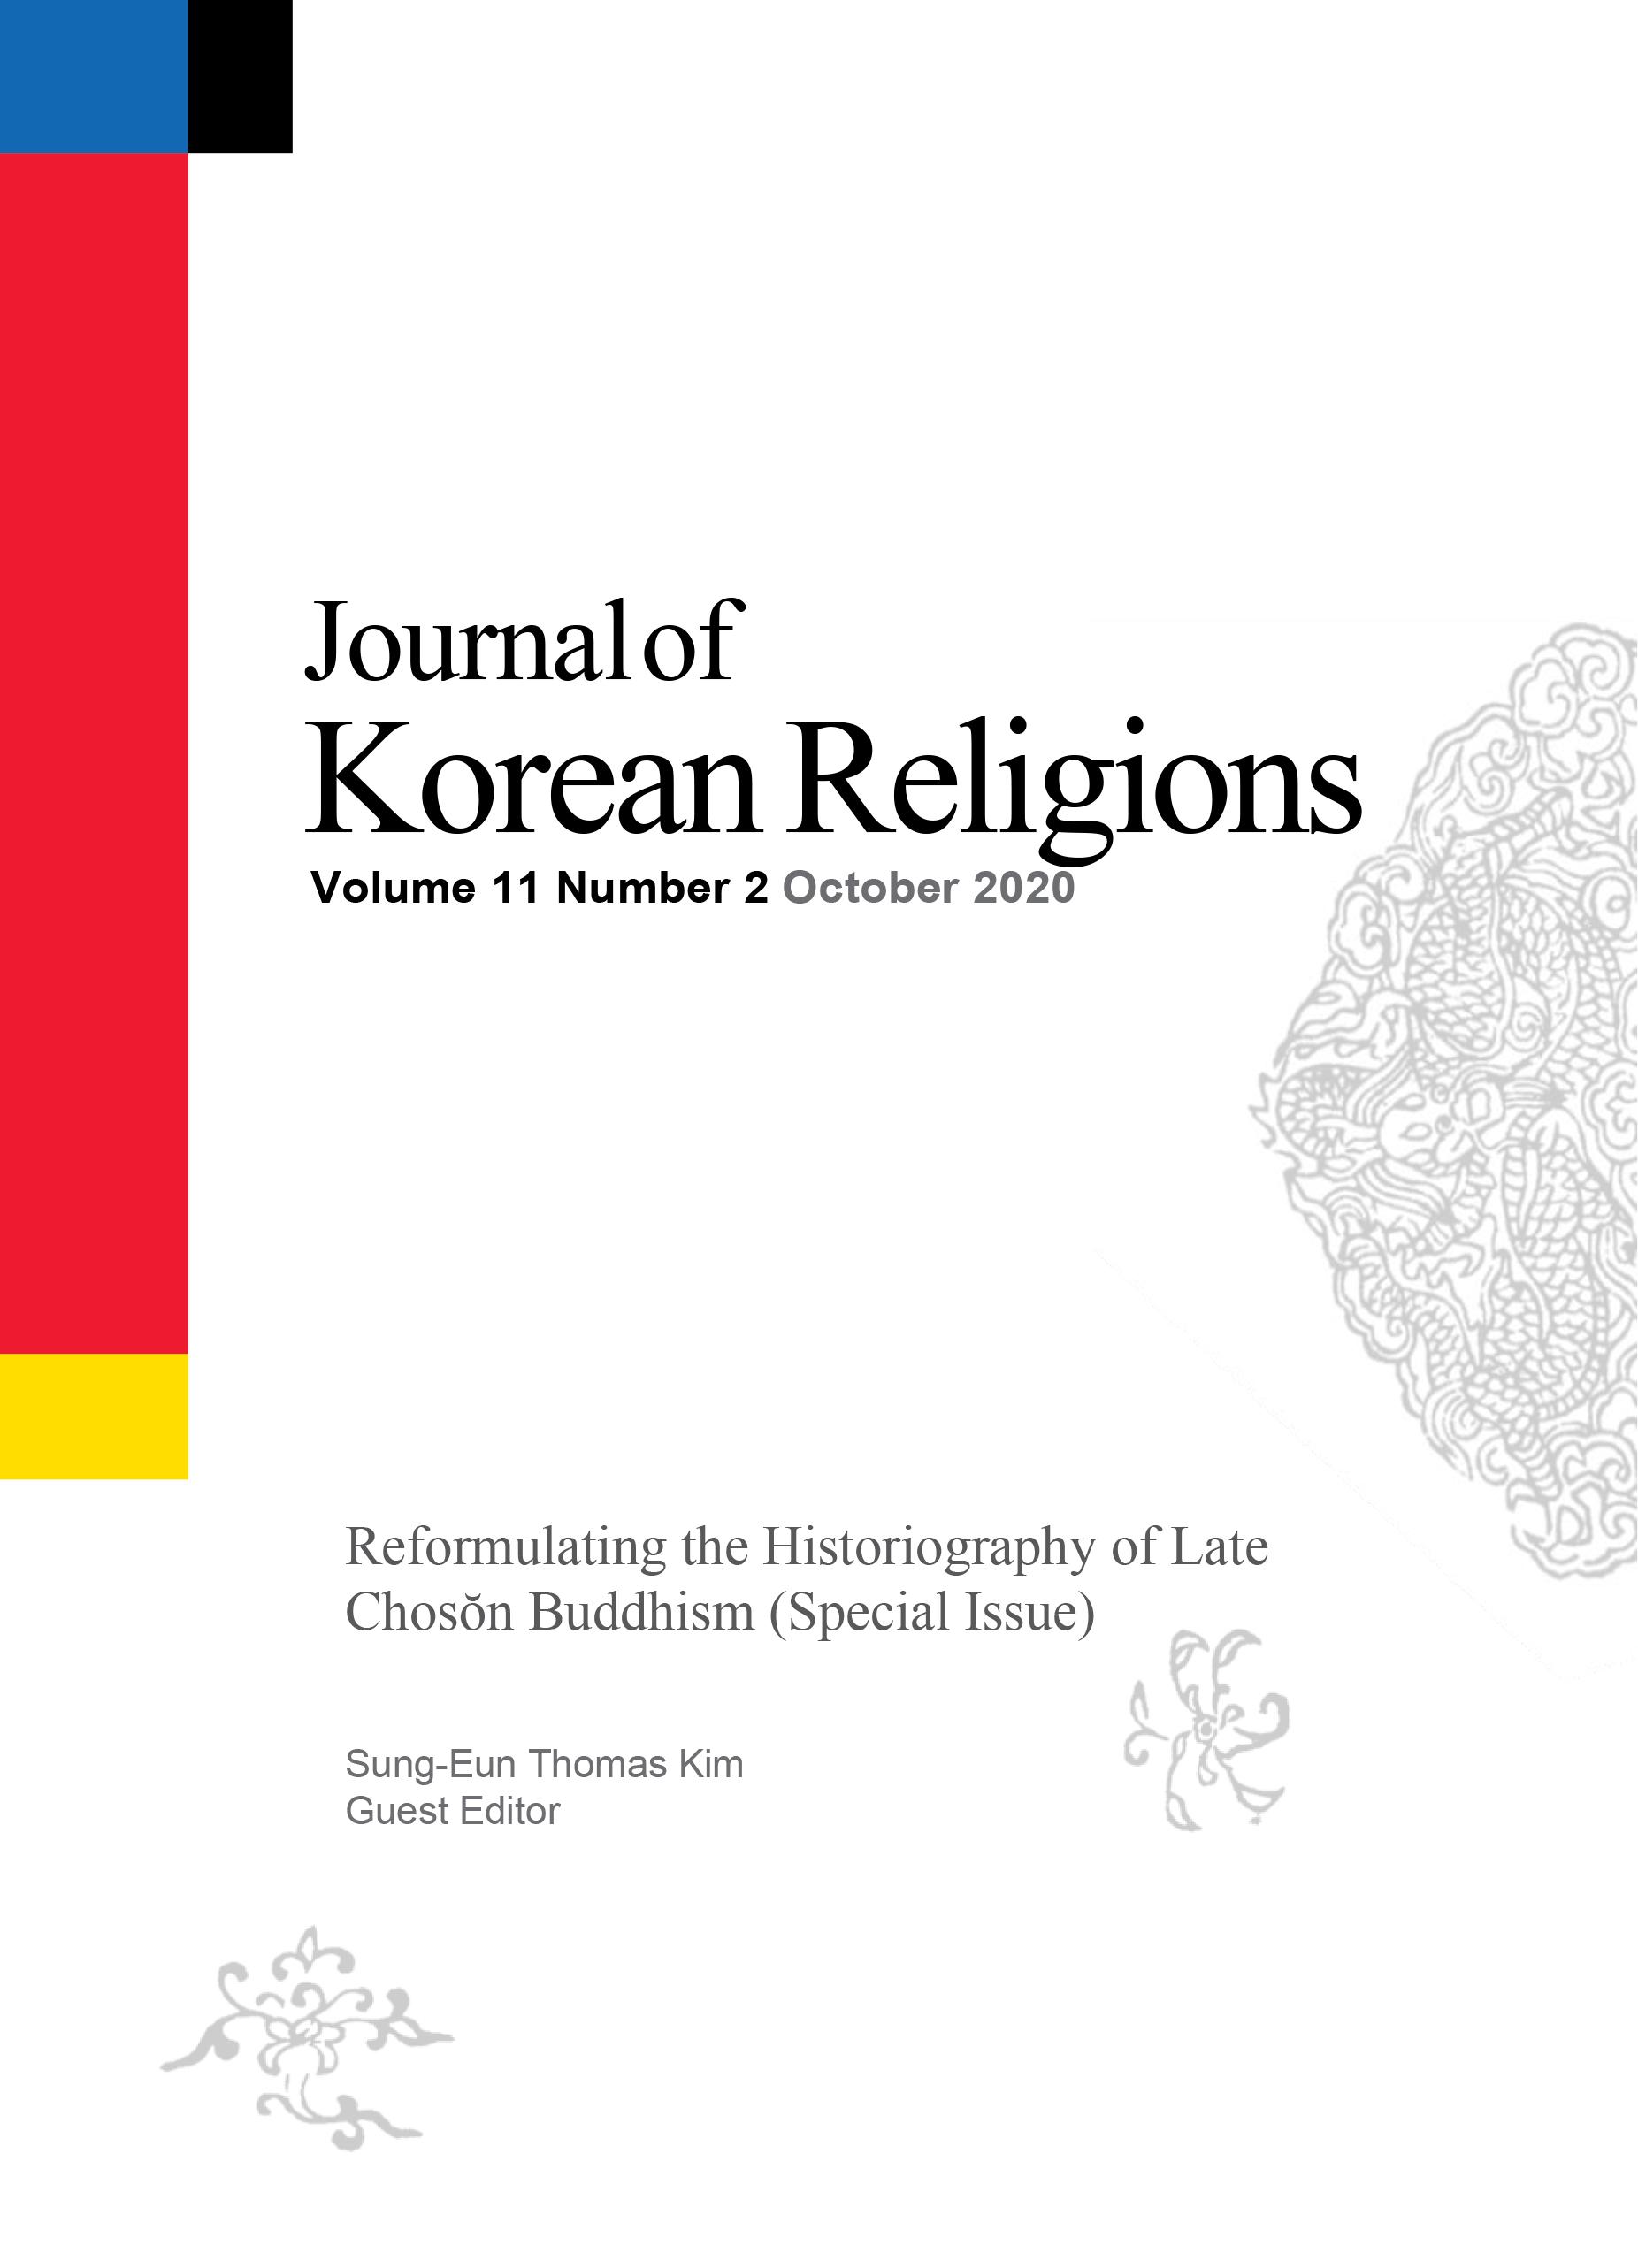 Journal of Korean Religions: Volume 11, Number 2, October 2020